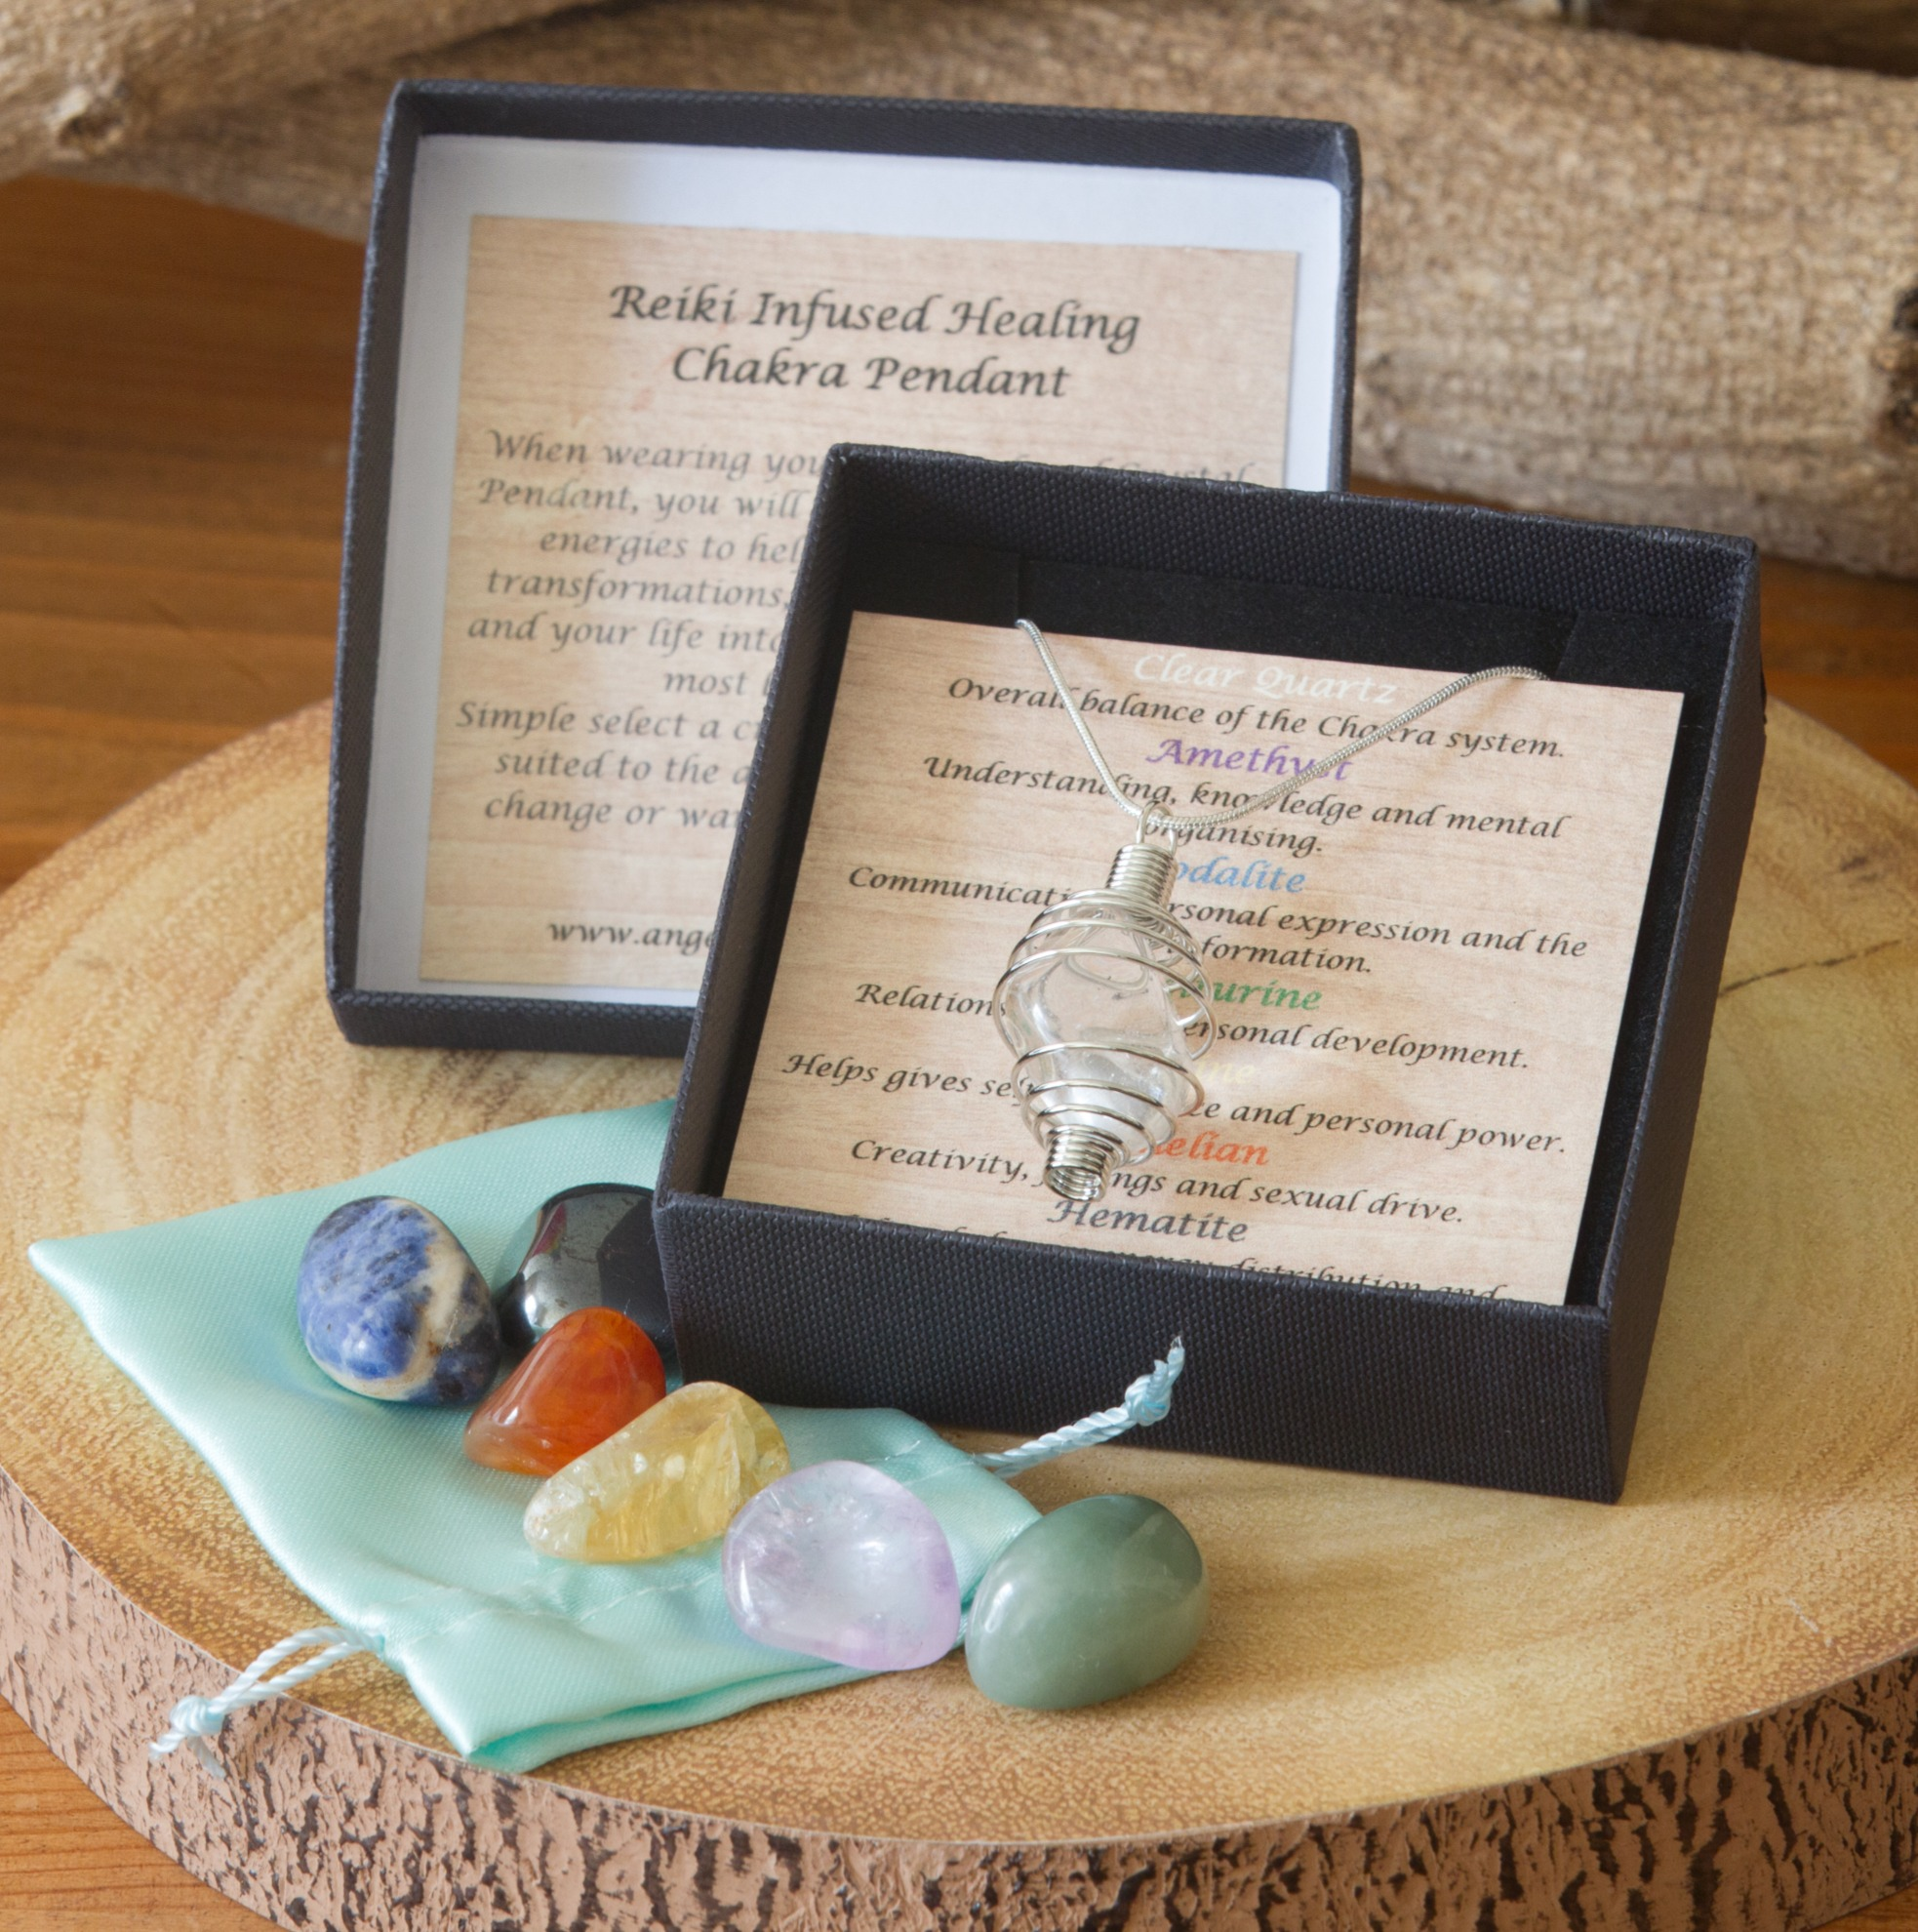 Chakra Reiki Infused Healing Crystal